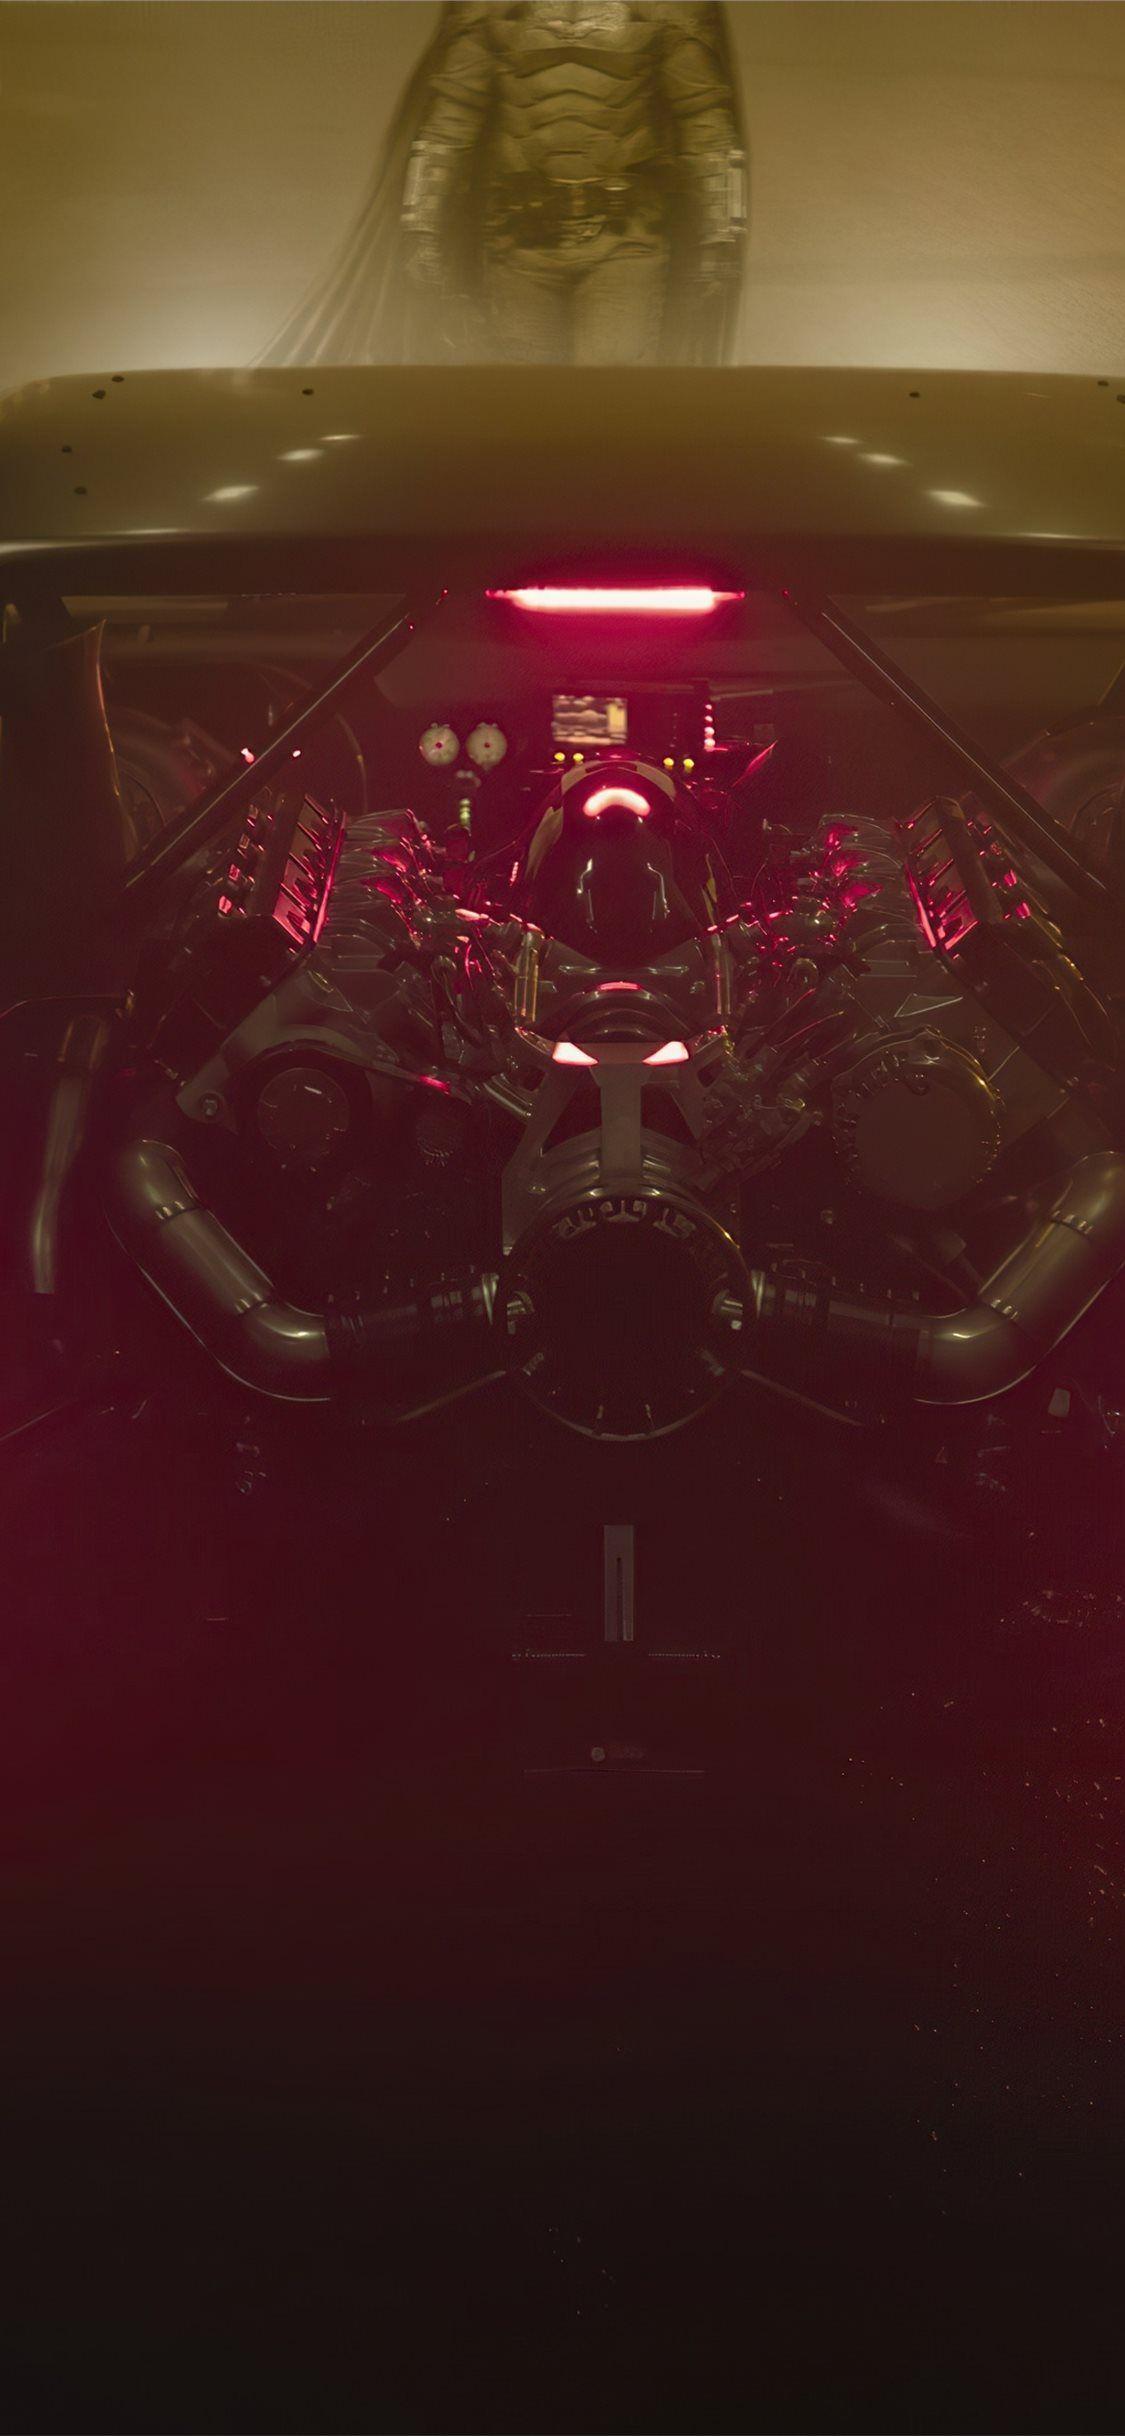 batmobile rear Robert Pattison batman 2021 Movies movies 4k 1125x2436